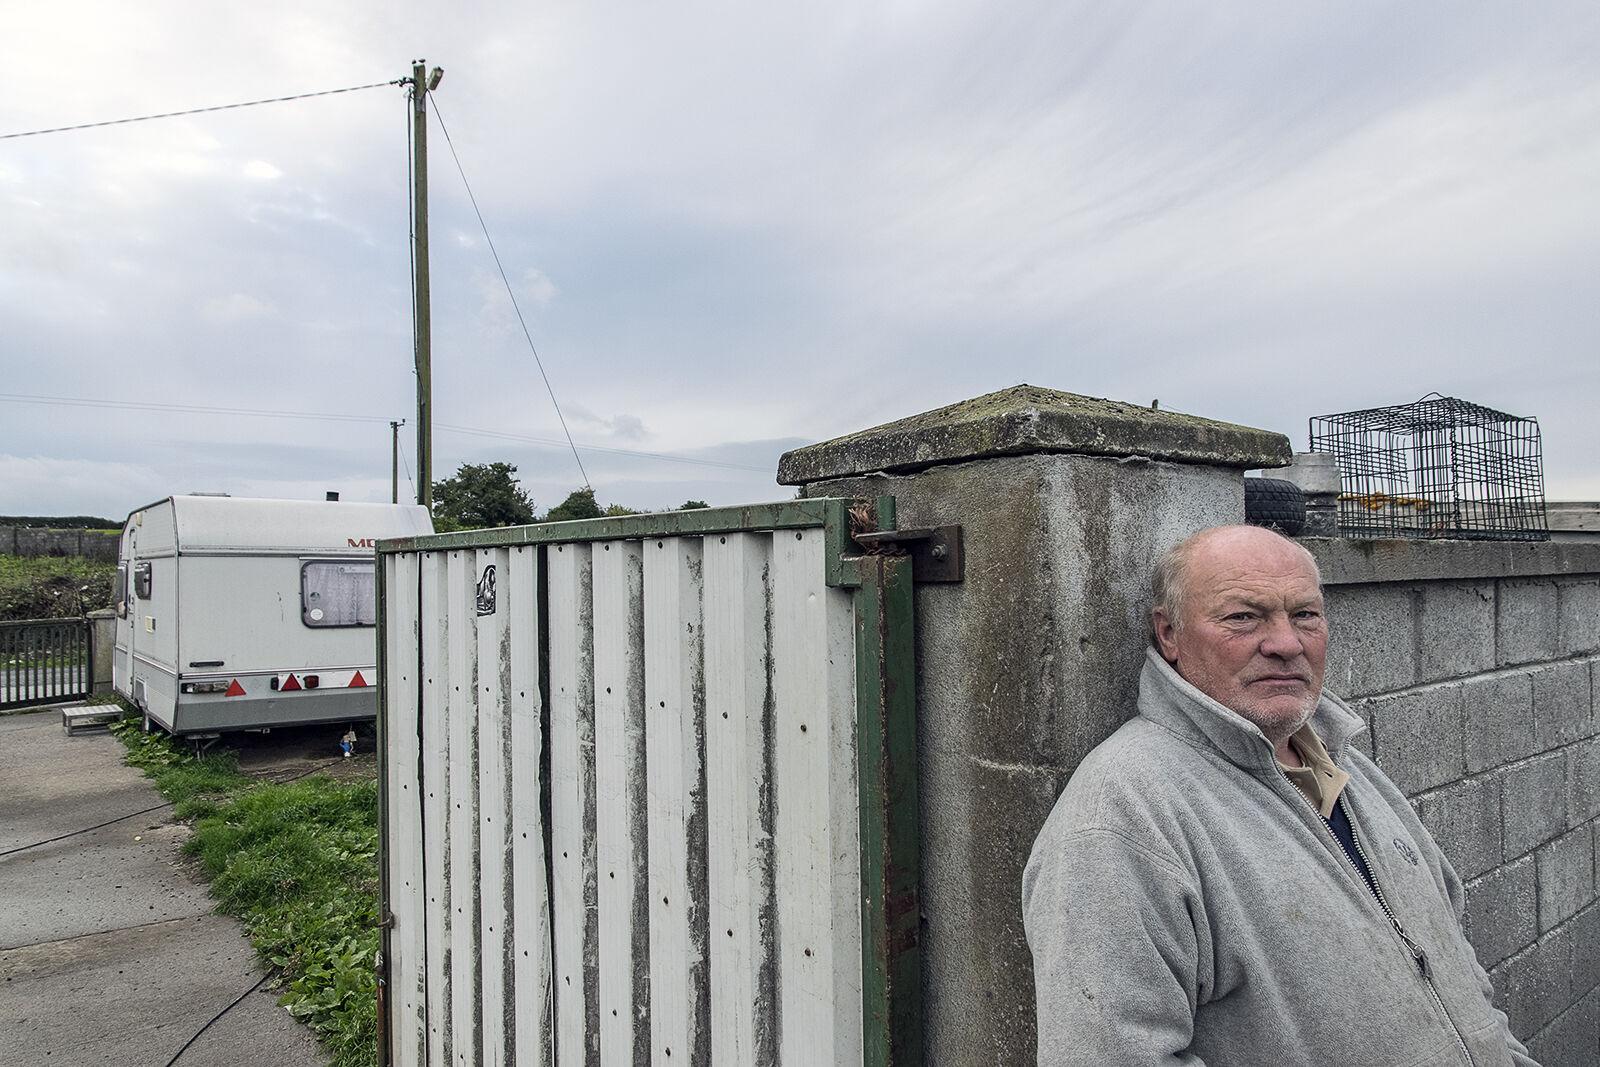 Jim, Tipperary, Ireland 2019